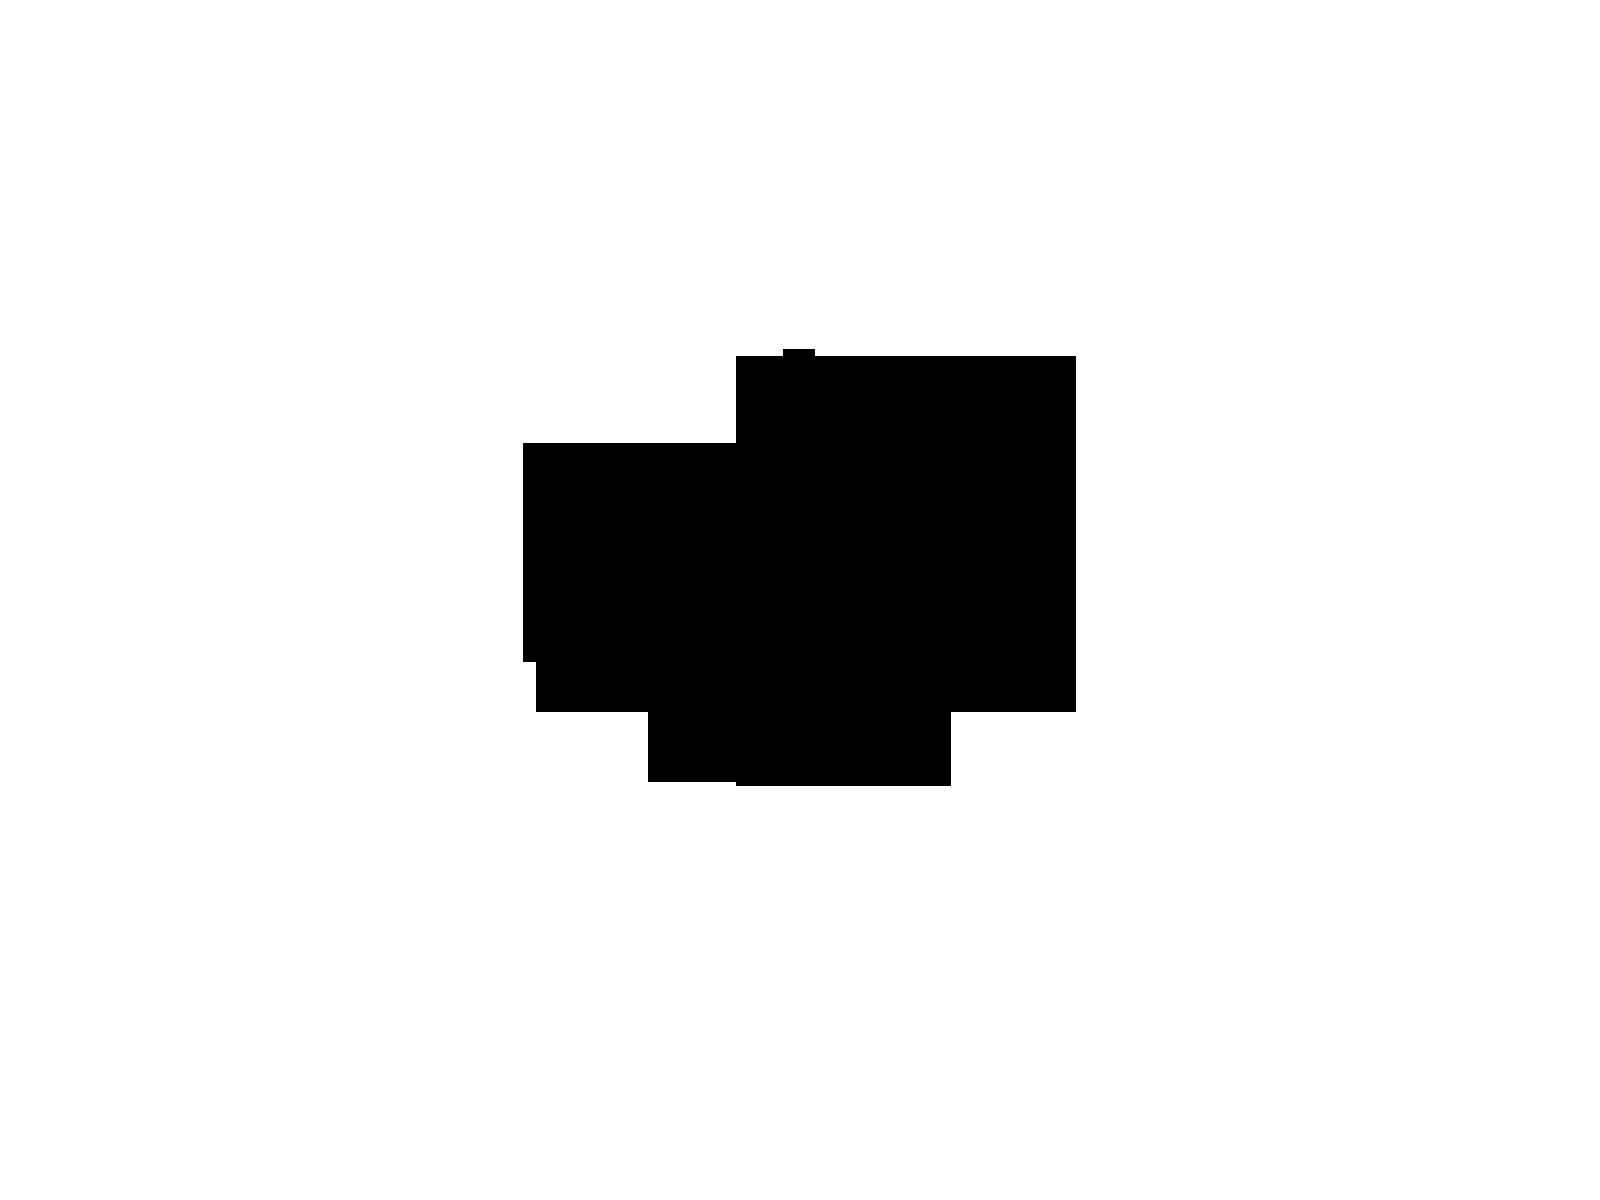 hallmark logo png image png 1600 1200 pixels design rh pinterest com king crown symbol text king queen crown logo